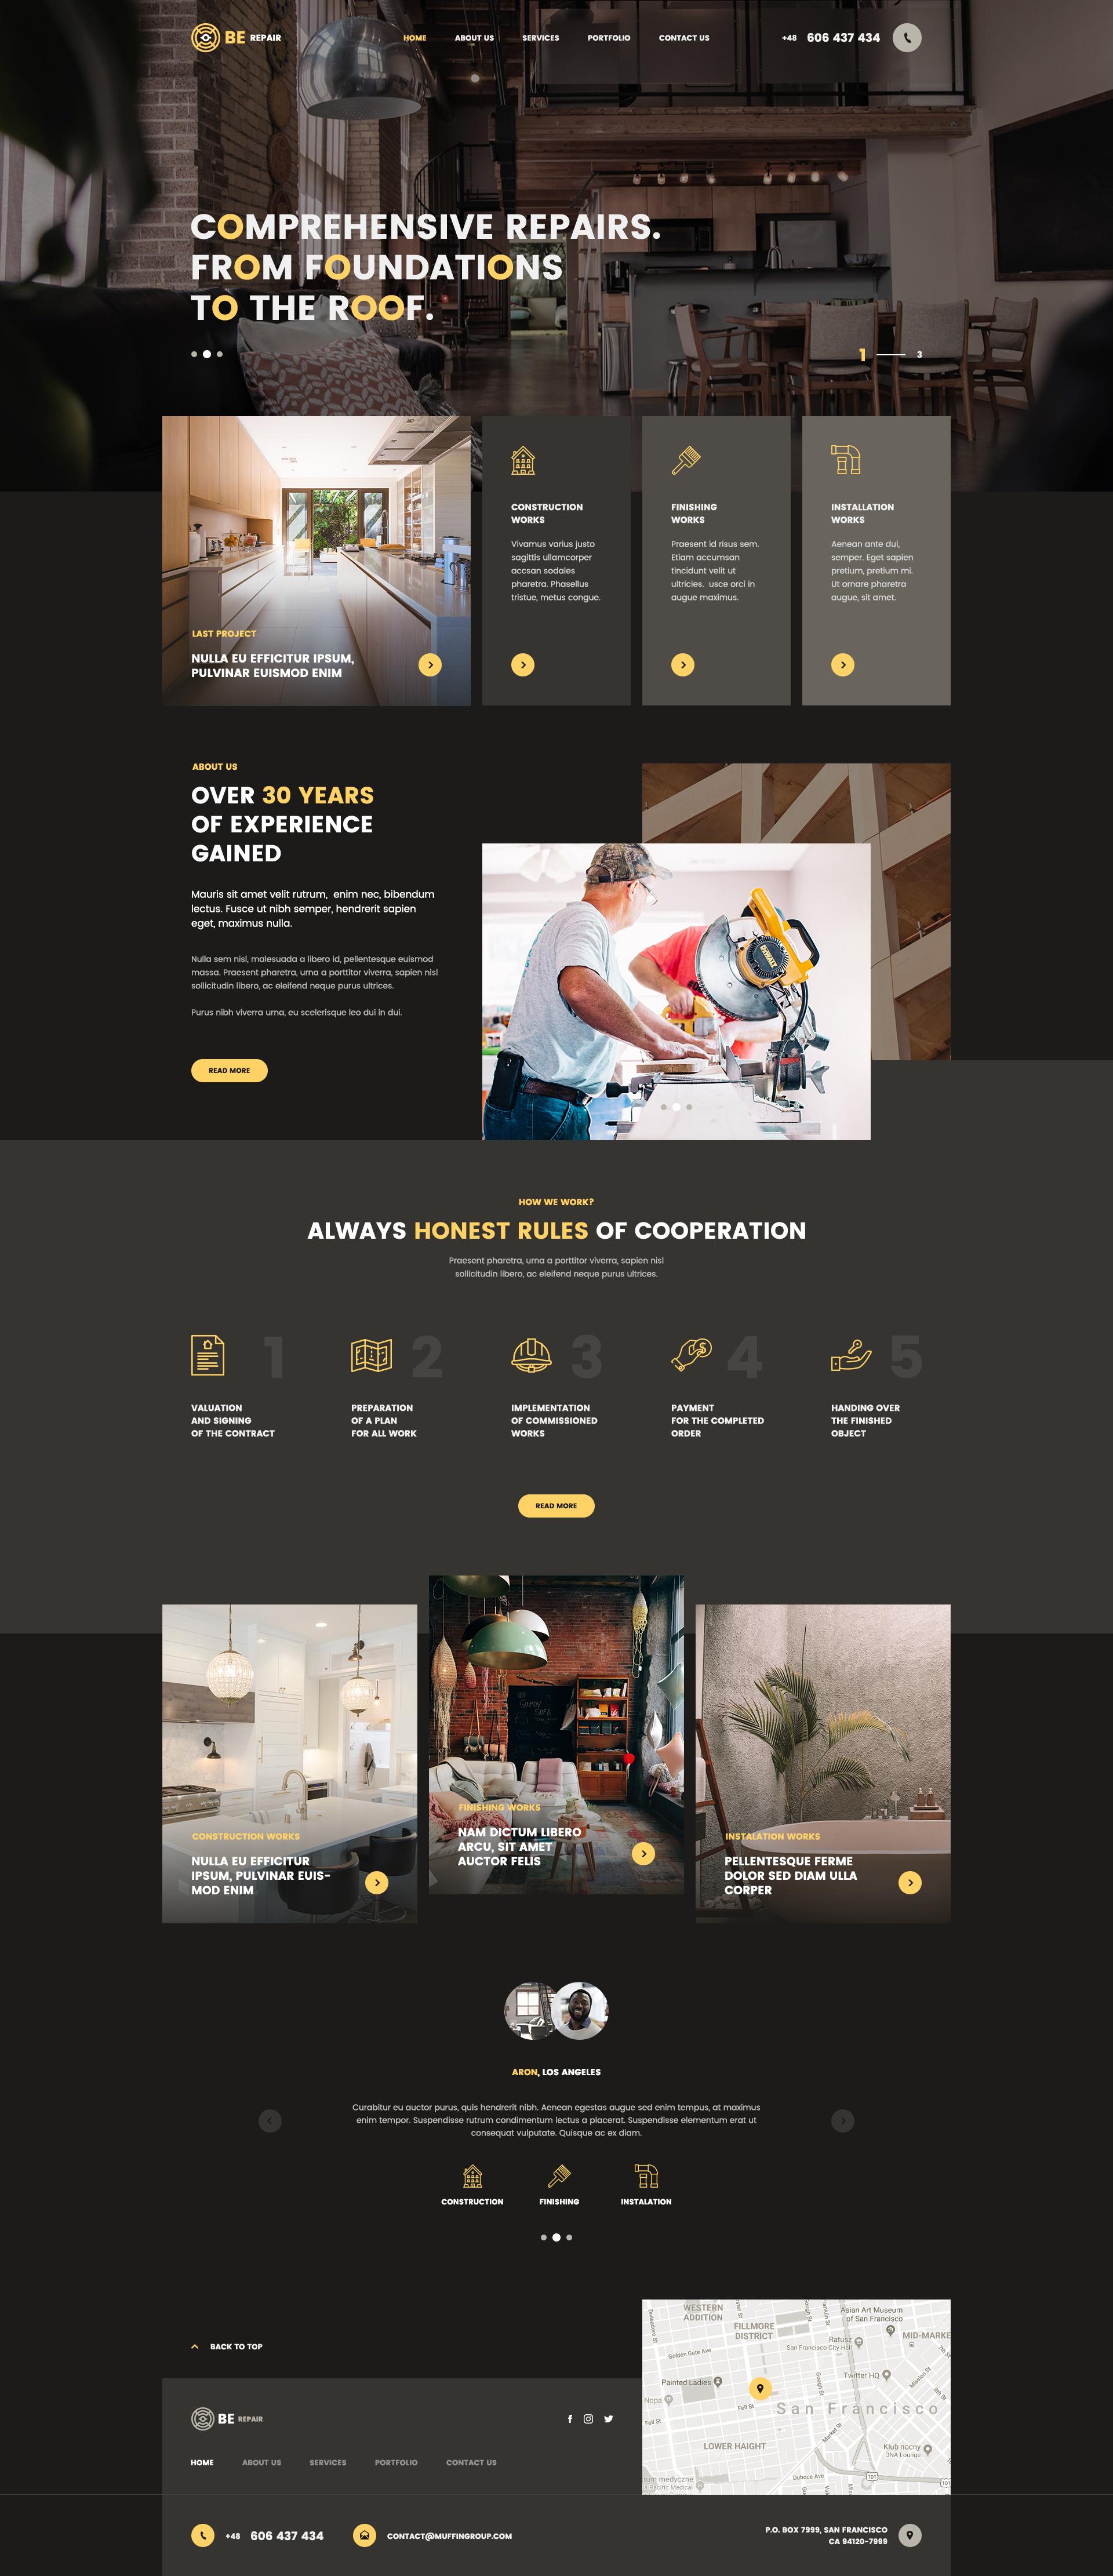 Berepair Minimalist Web Design Web Design Tips Web Template Design